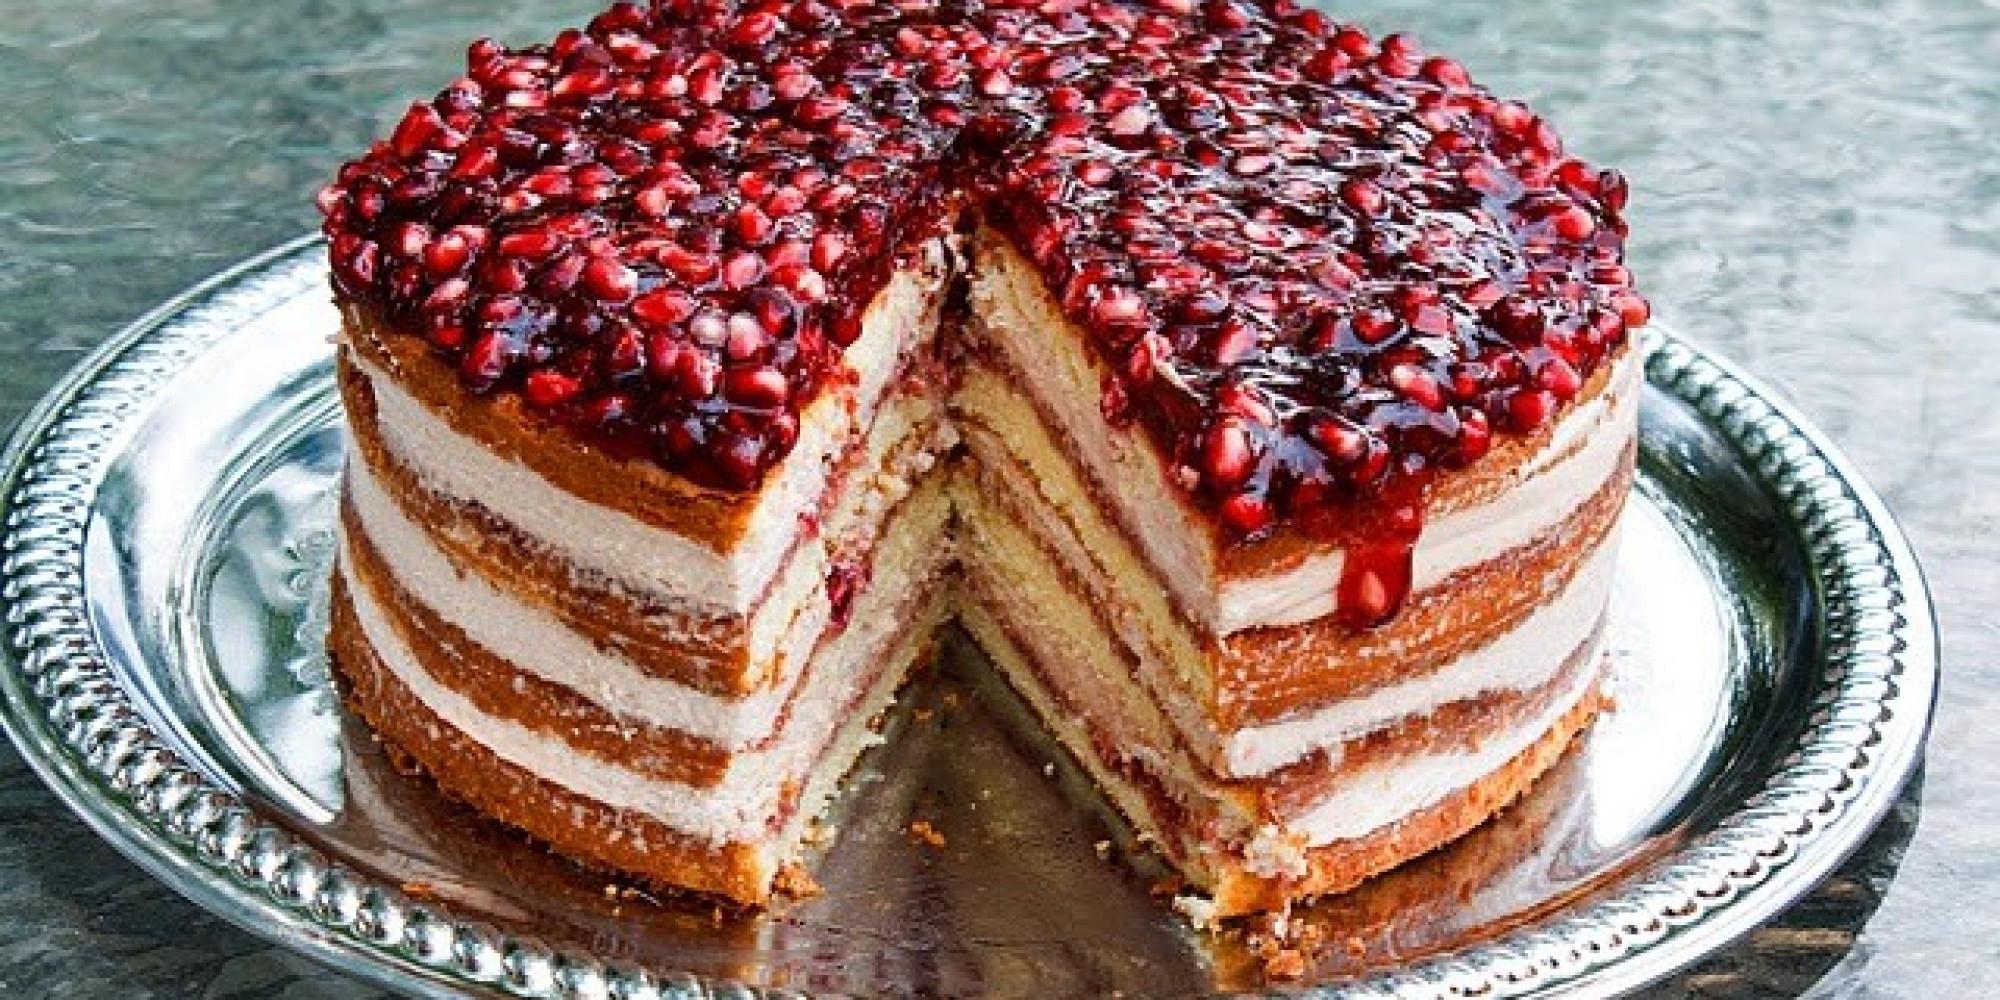 Best Christmas Dessert  The Most Stunning Christmas Dessert Recipes Ever PHOTOS